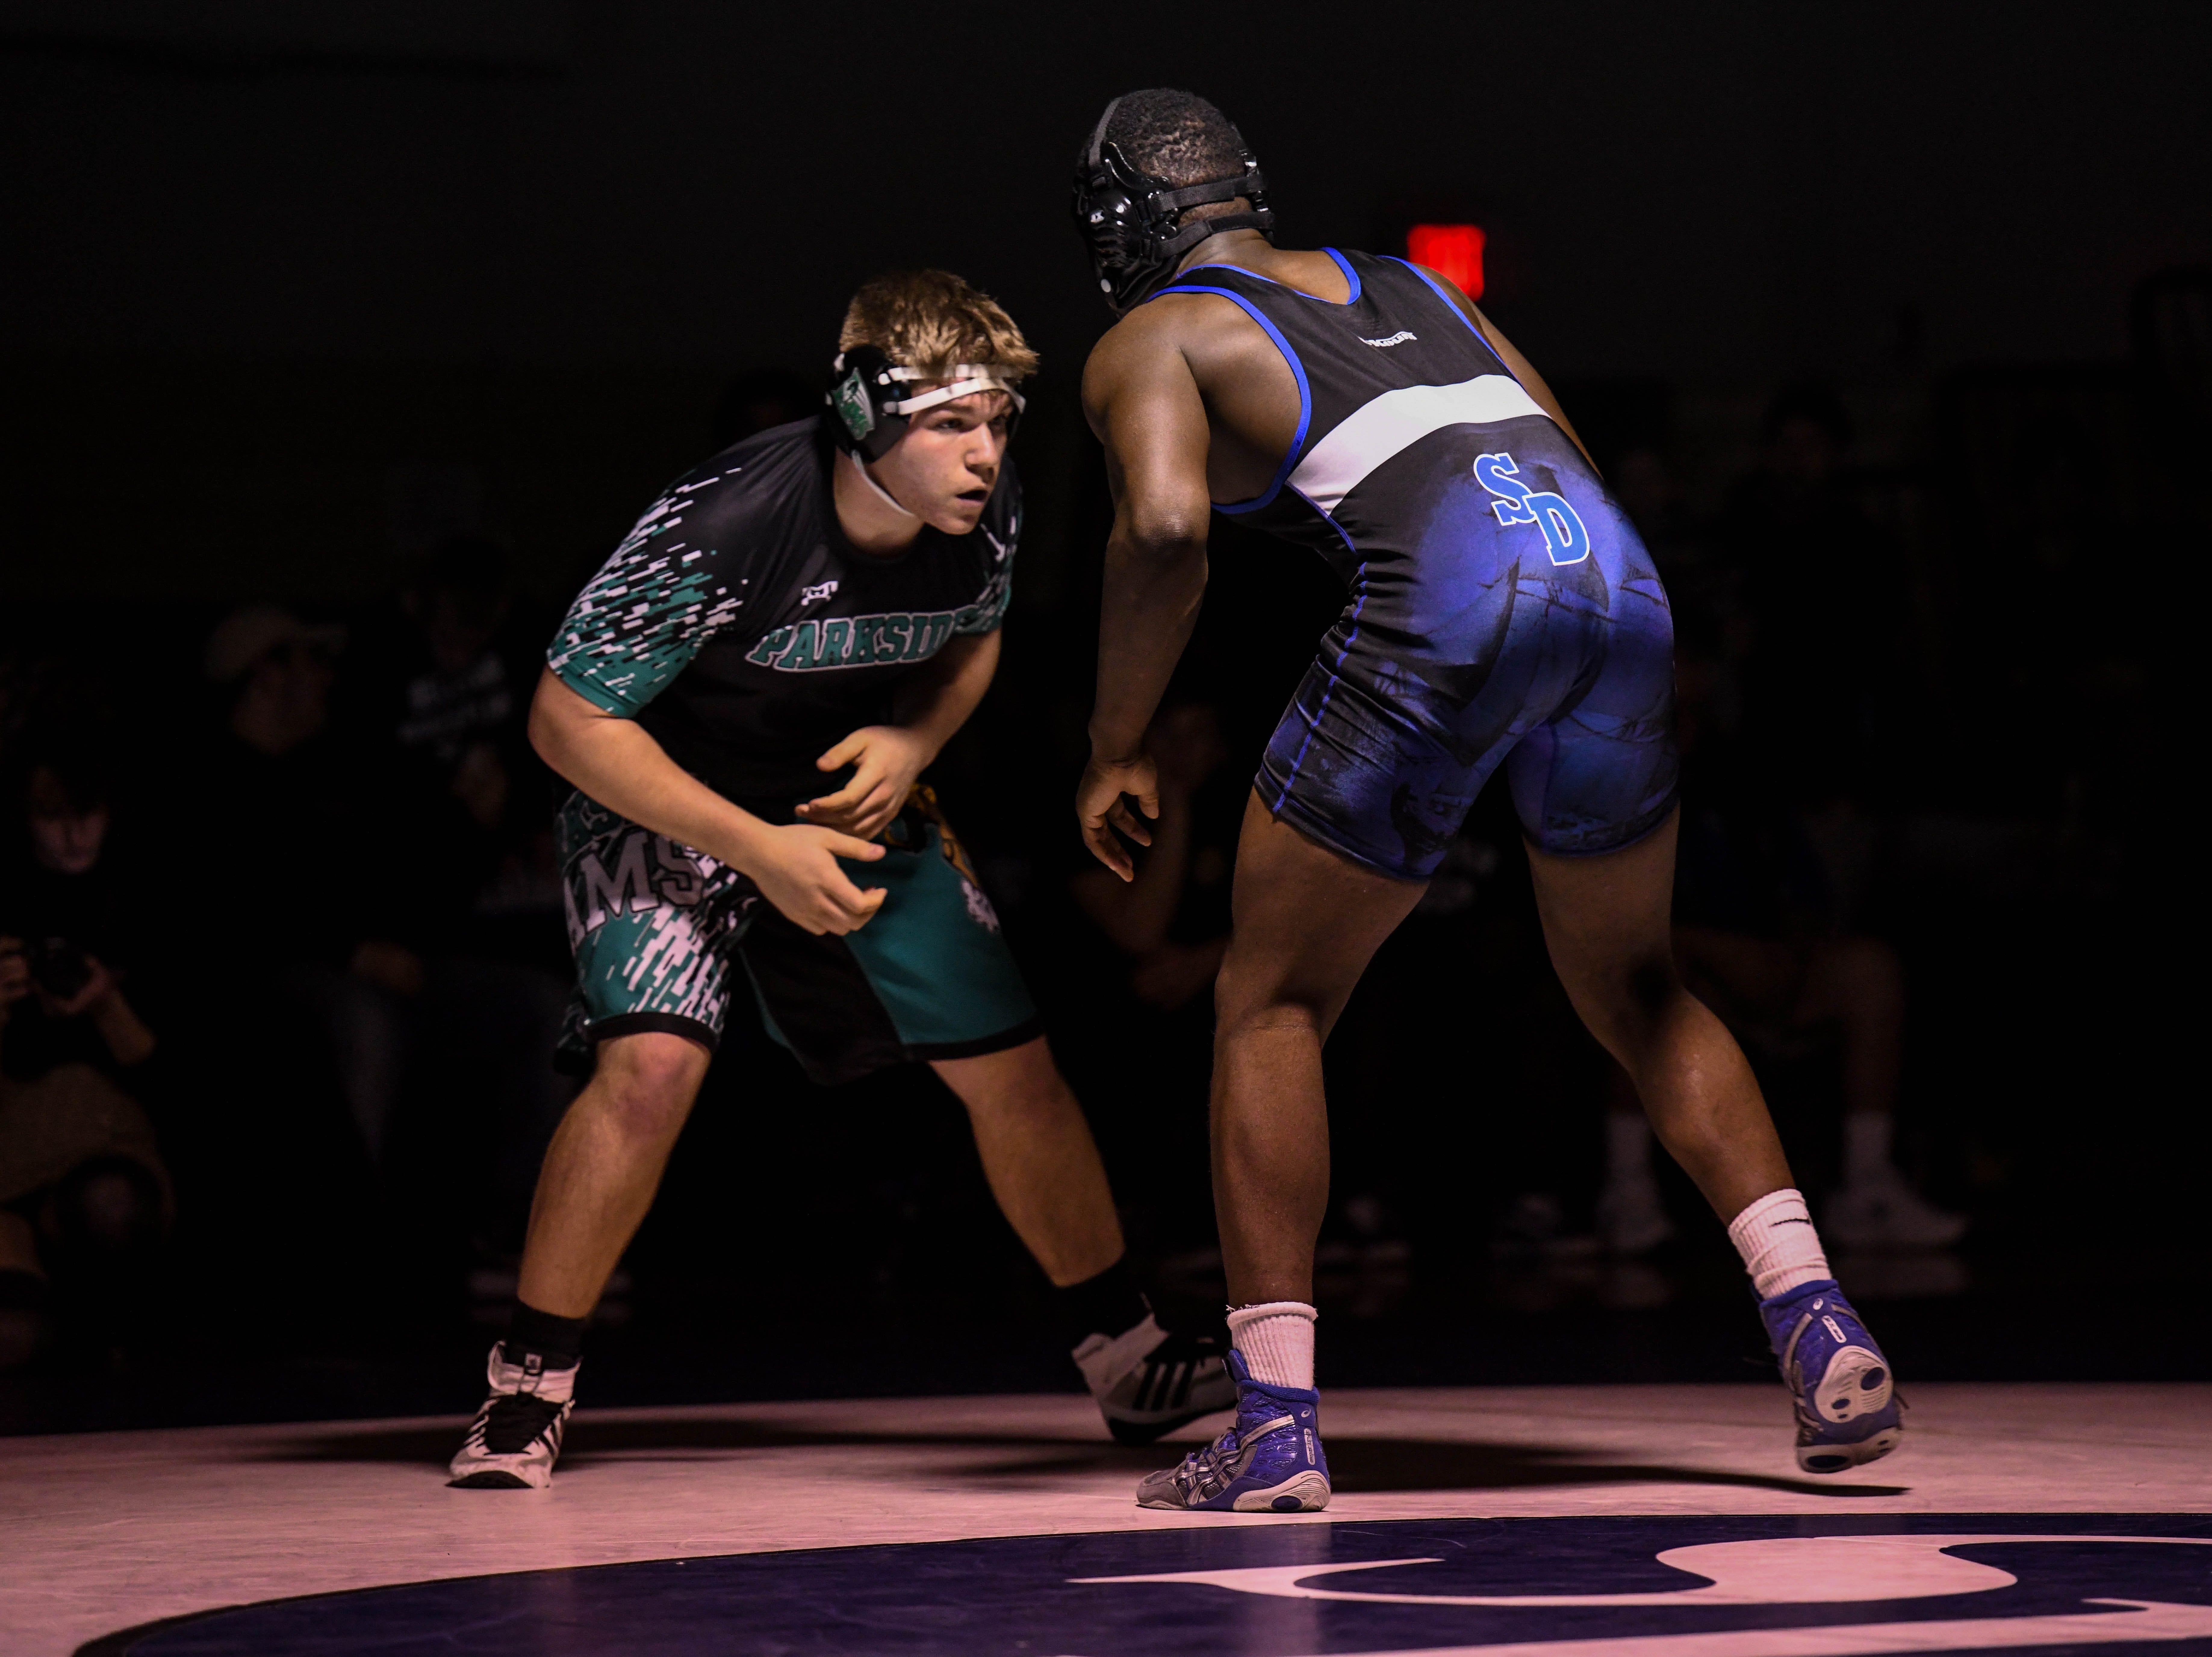 Stephen Decatur's Daletez Smith wrestles against Parkside's Alex Waidner in the 220 match up at Stephen Decatur High School on Wednesday, Jan. 23, 2019.